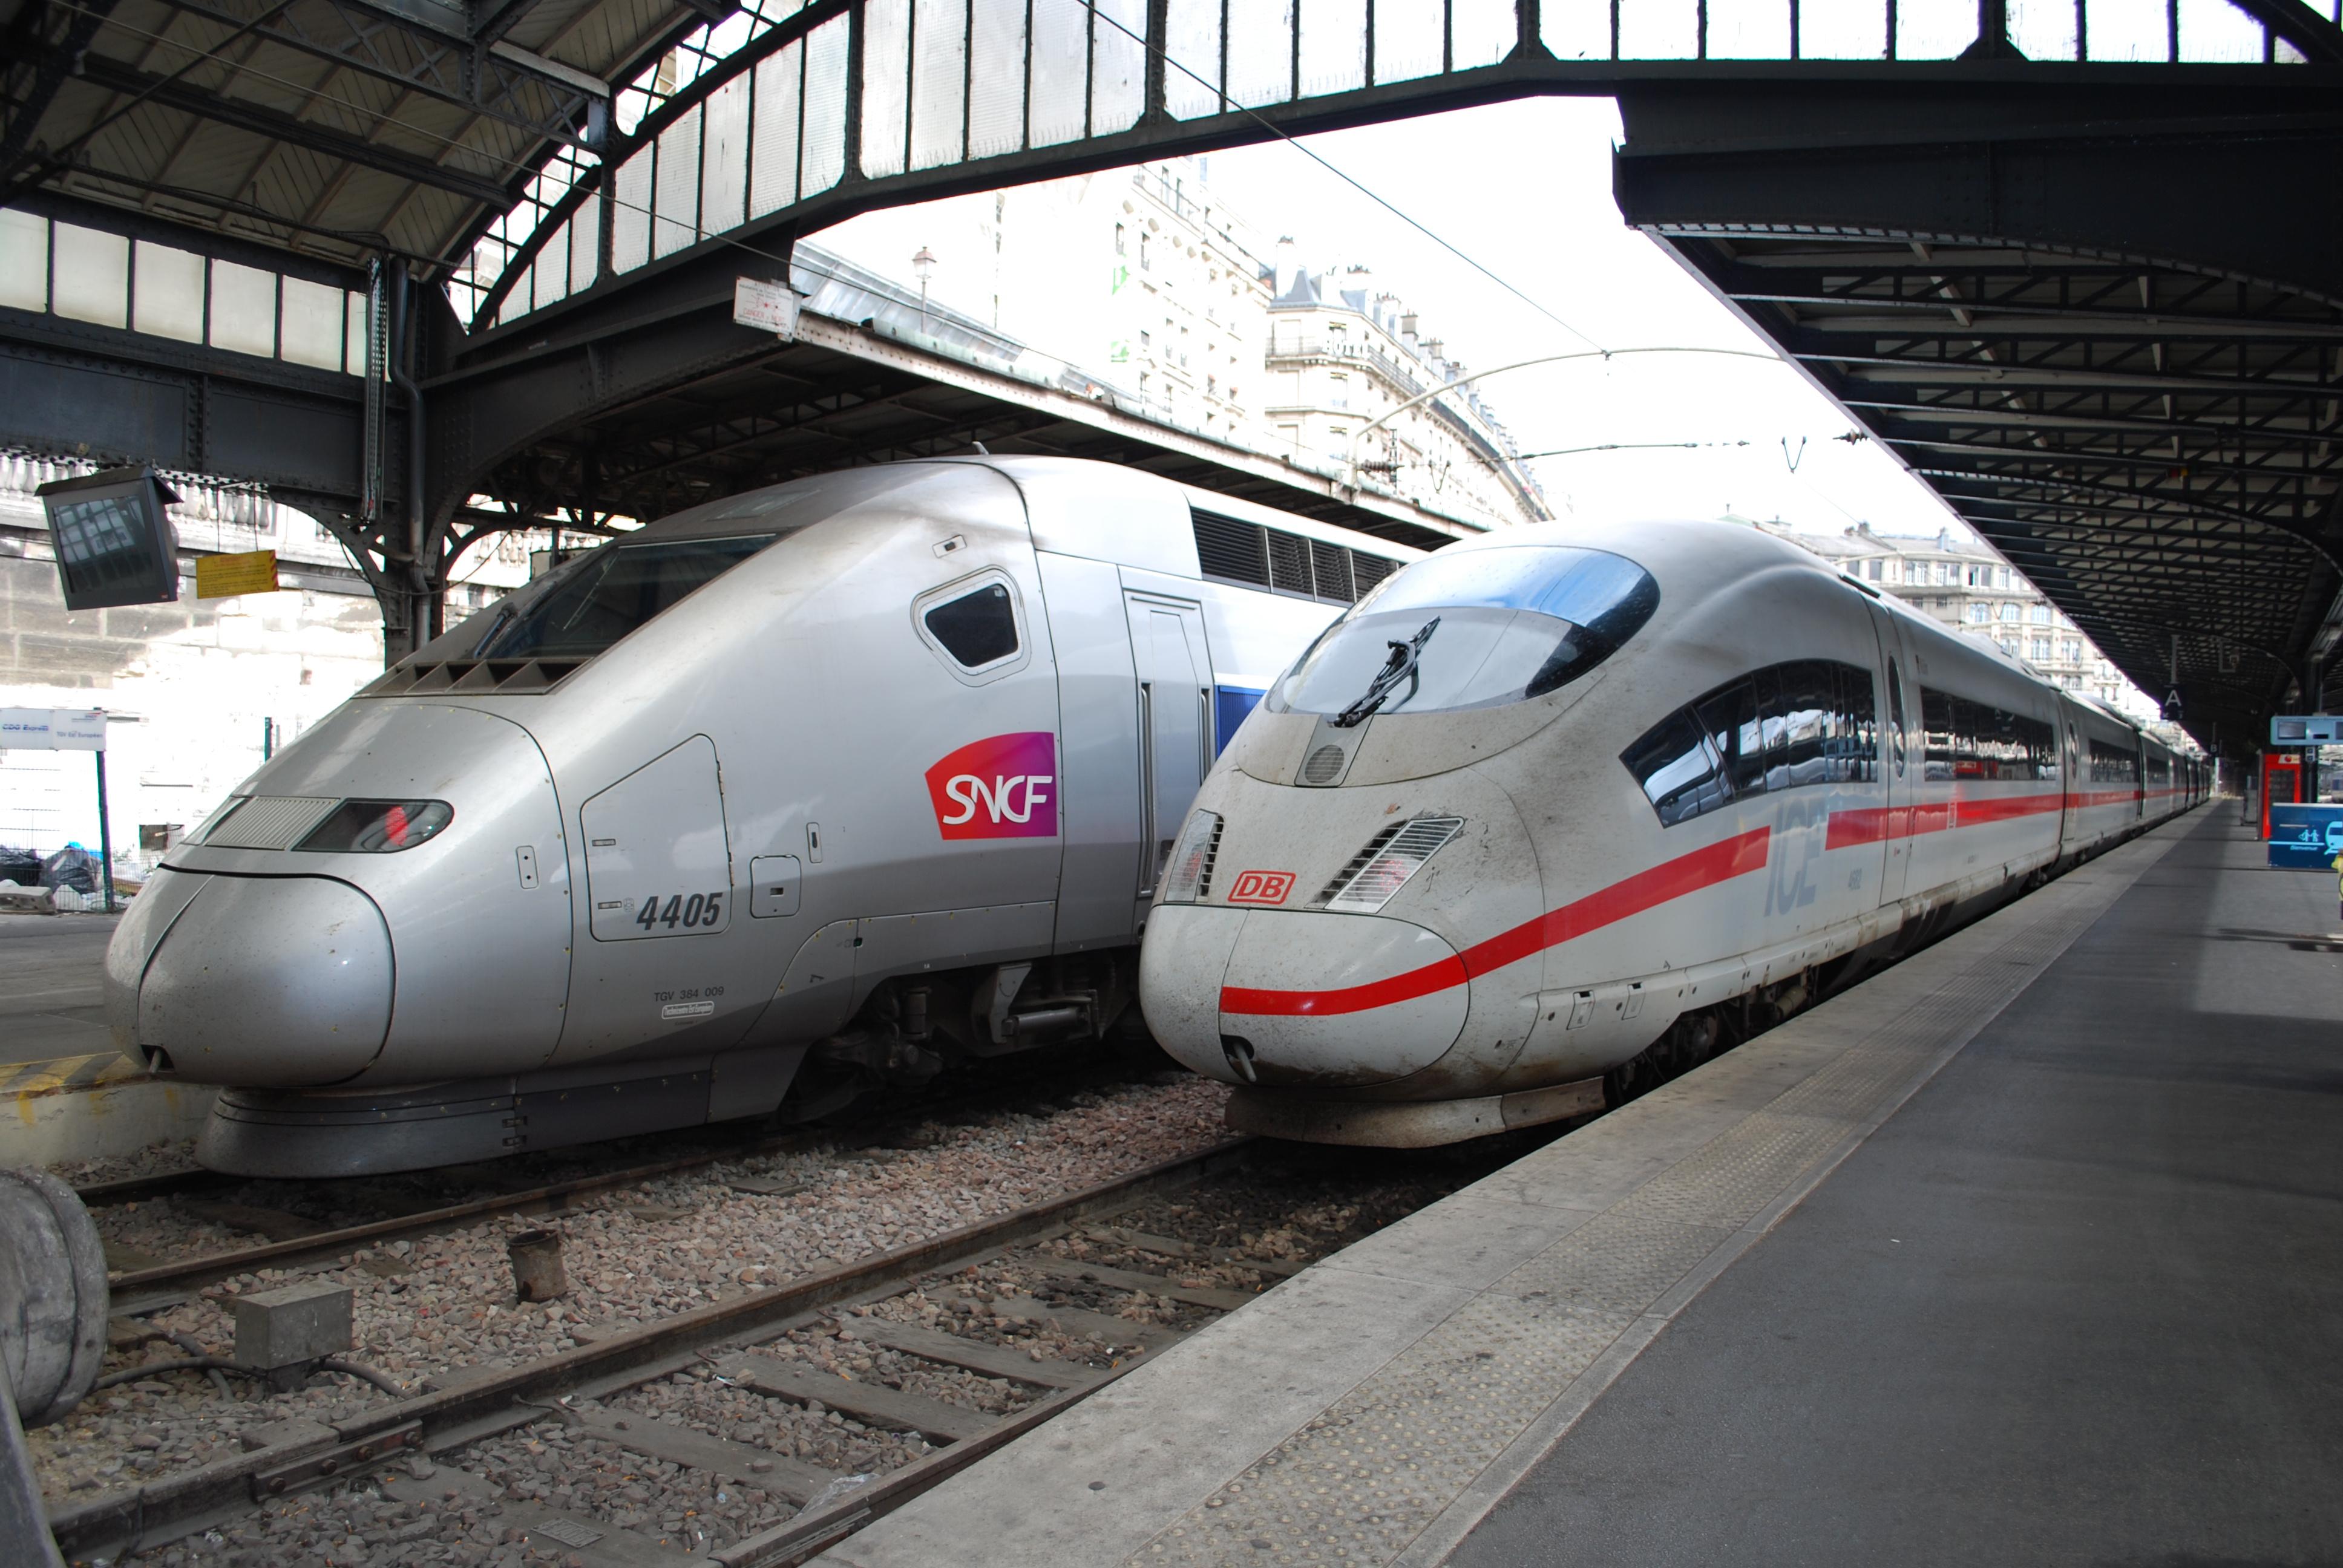 3m Stock Chart: TGV-POS 6 ICE-3M (8067623398).jpg - Wikimedia Commons,Chart